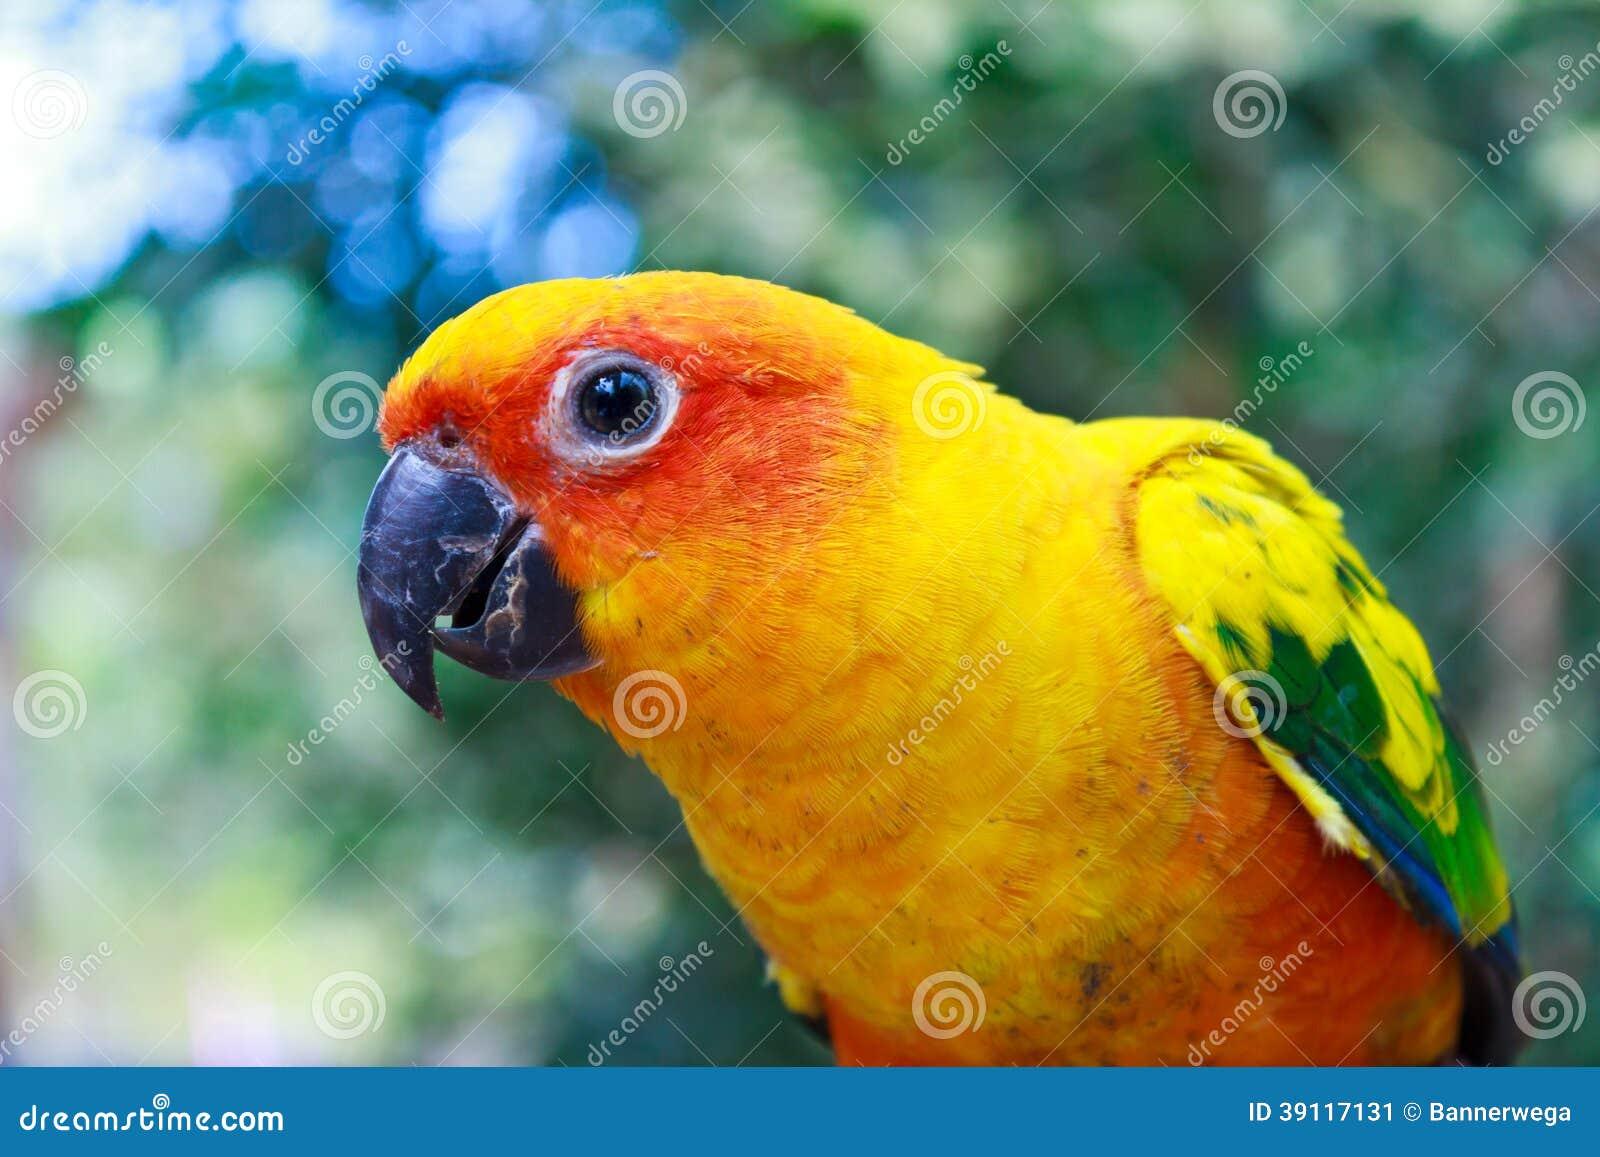 Mooie kleurrijke papegaai